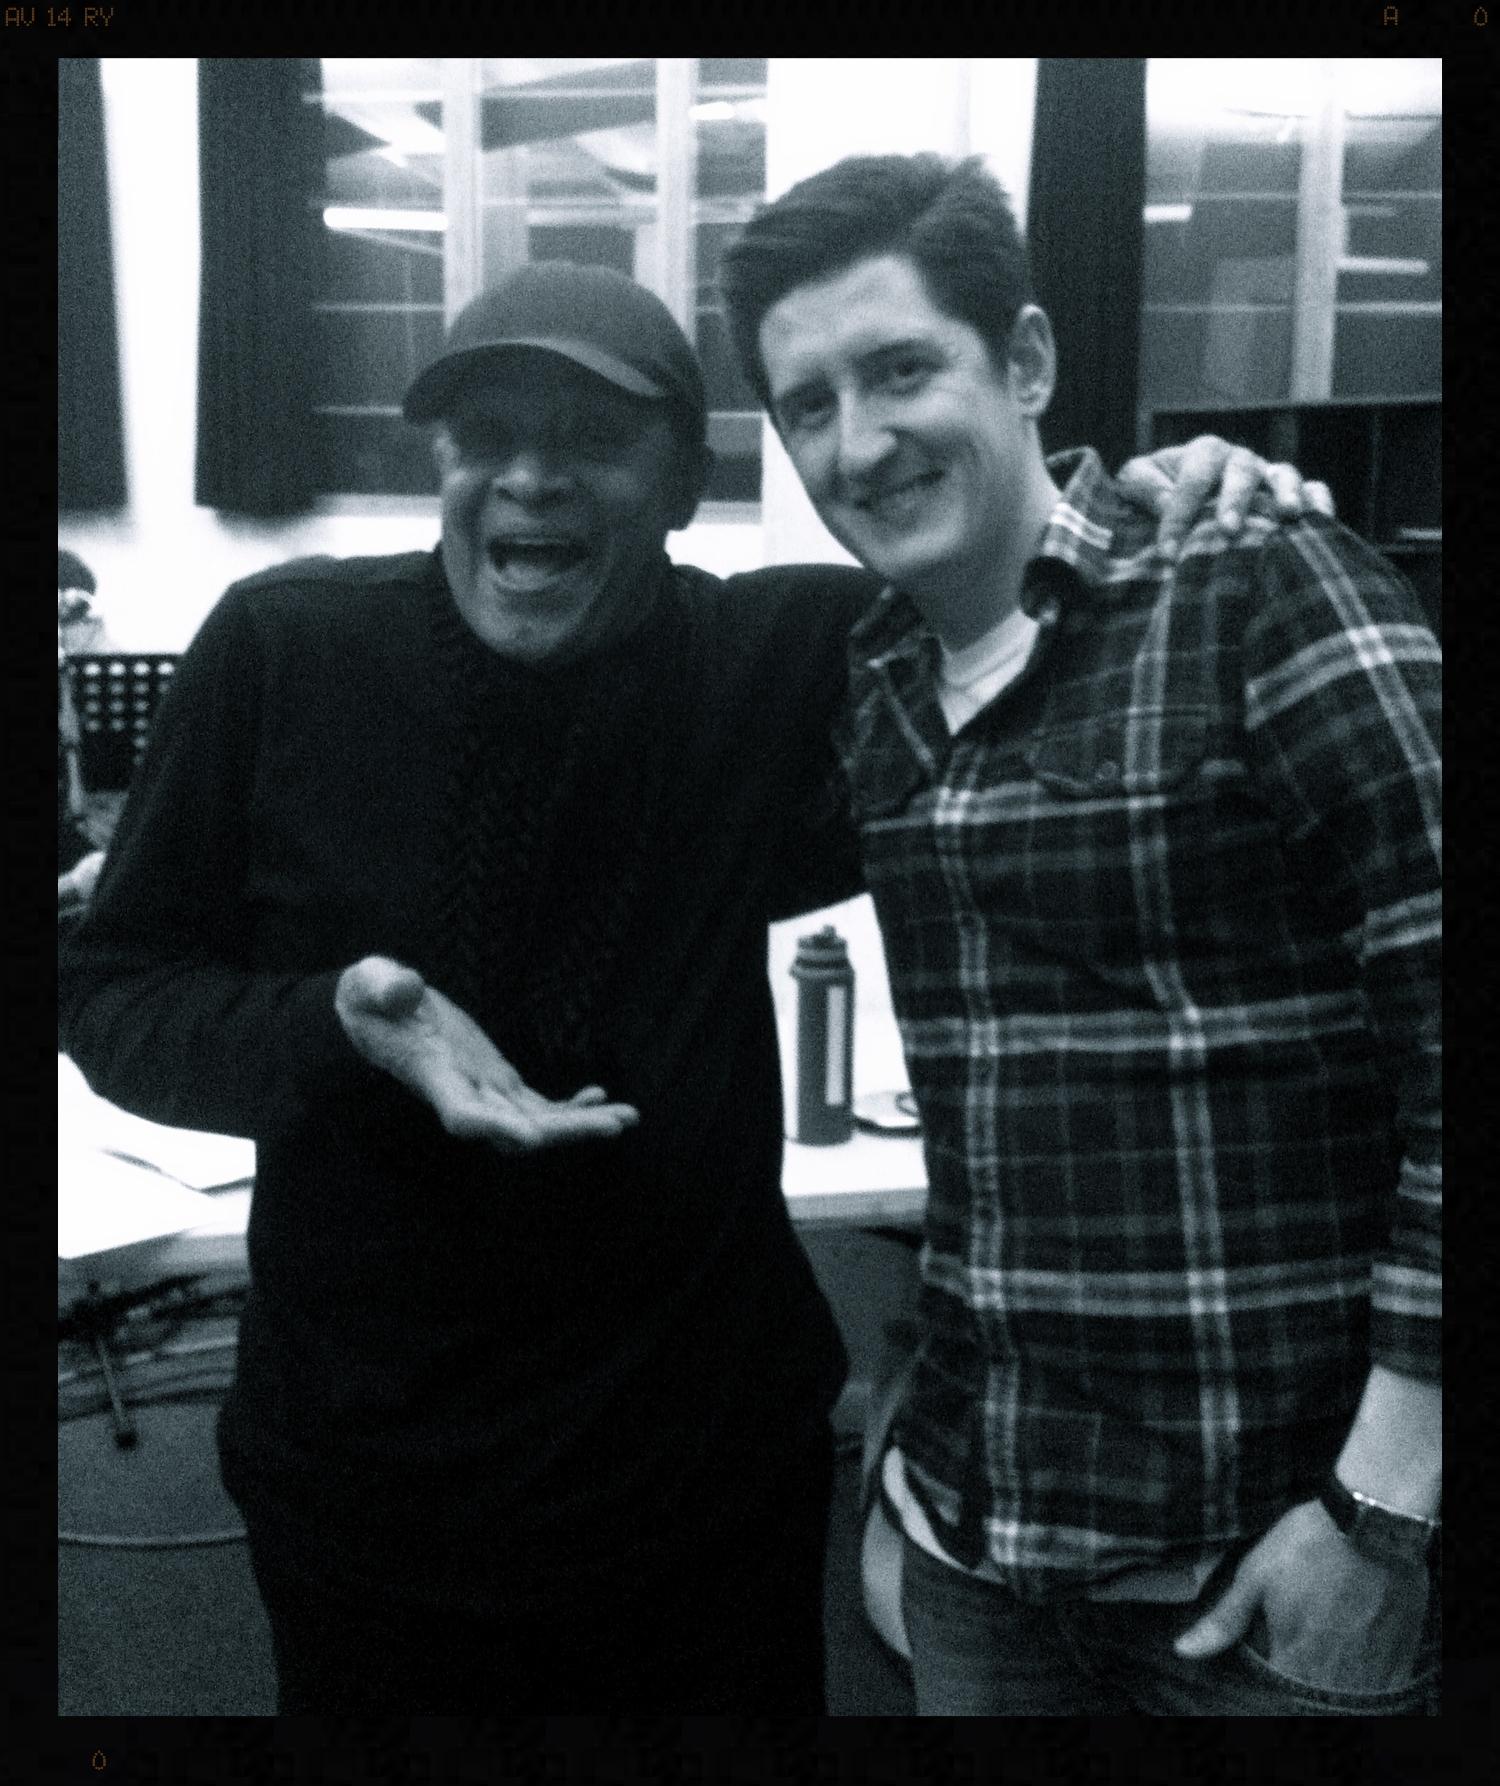 With Al Jarreau, Music BankFeb '14